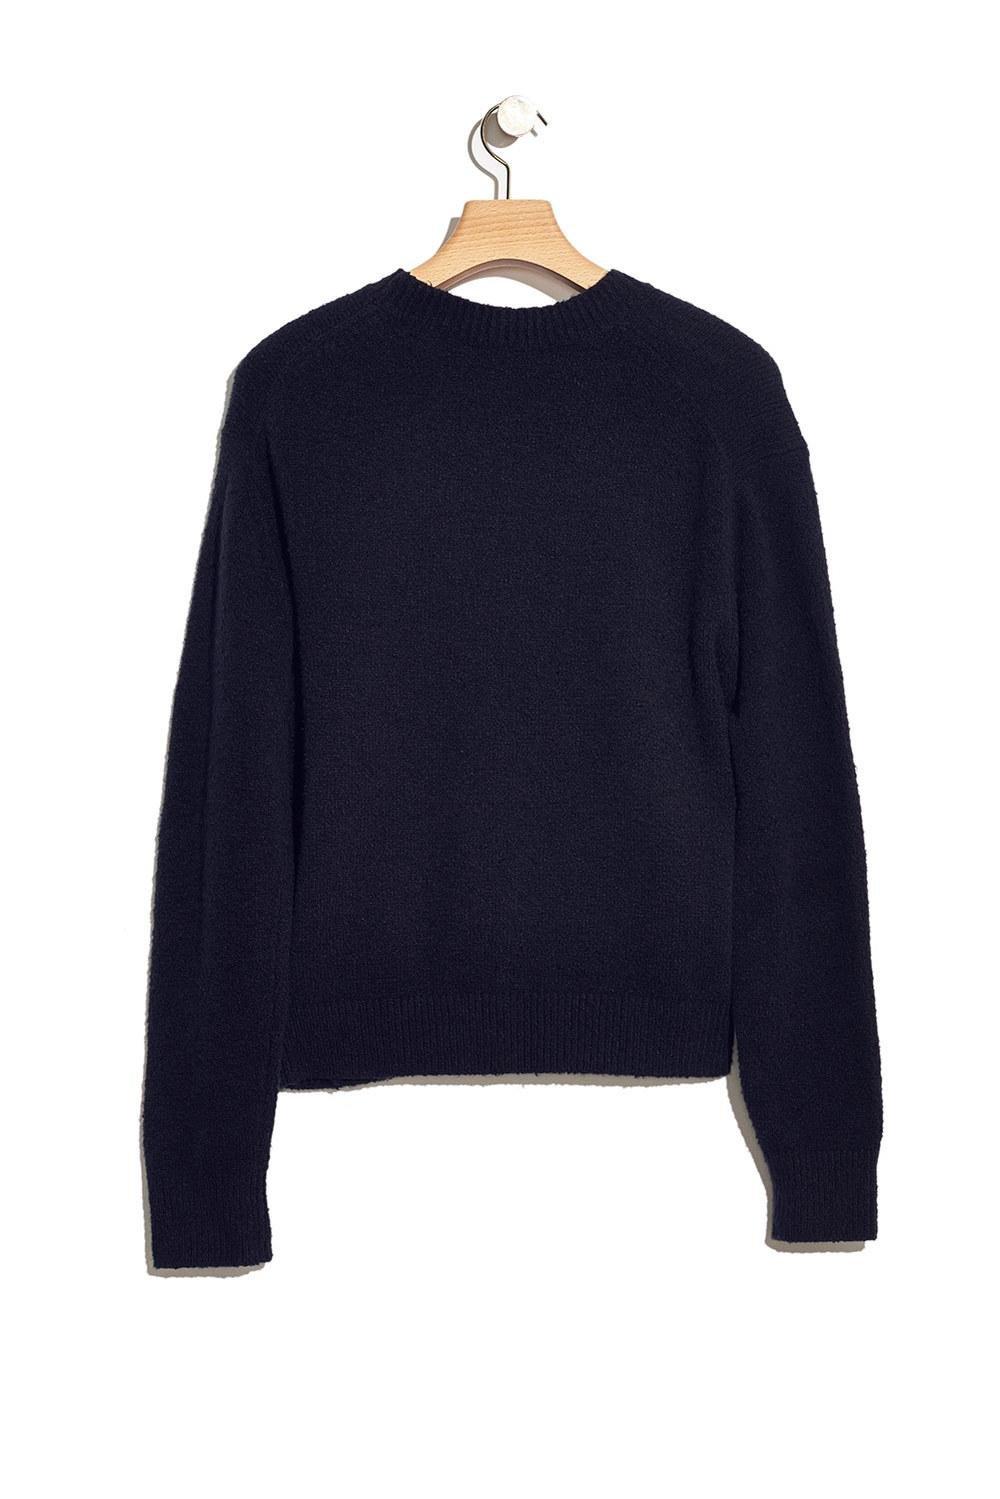 3.1 Phillip Lim Cotton Floral-intarsia Crewneck Sweater in Black for Men